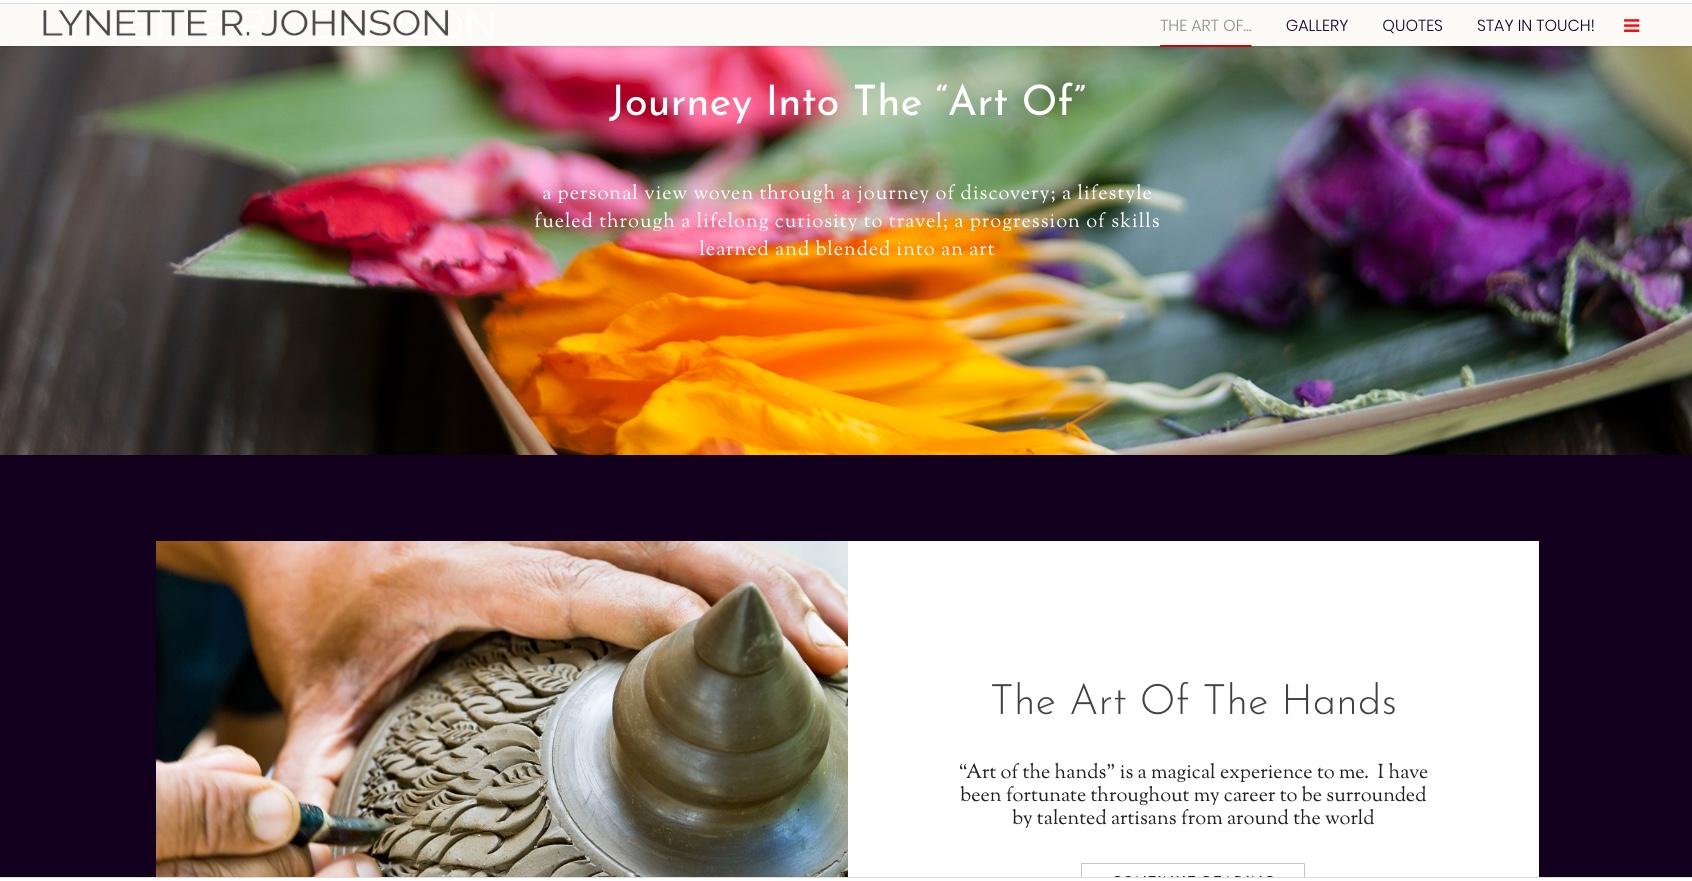 The Art Of website